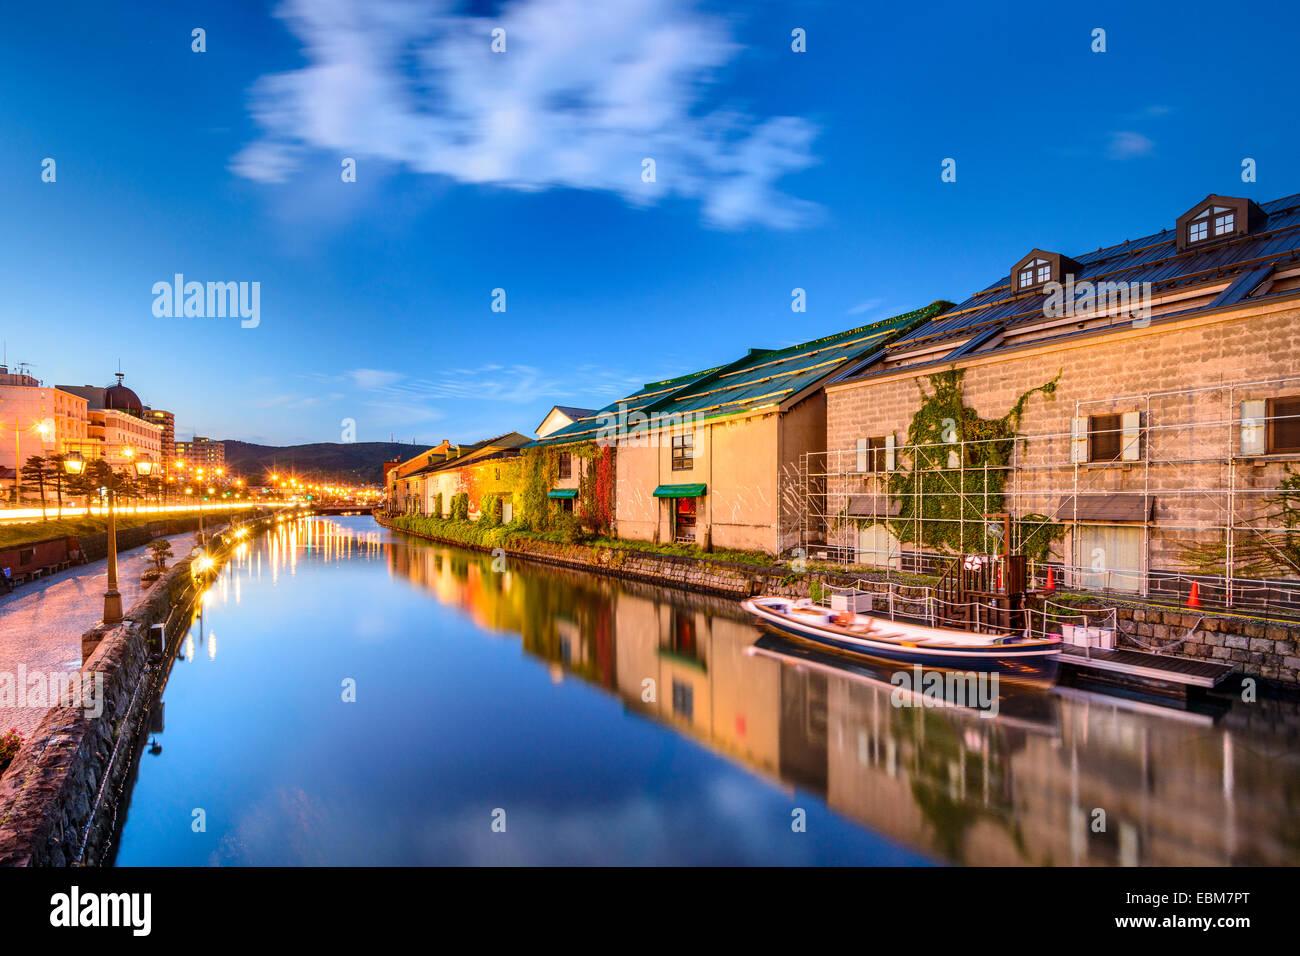 Otaru, Japan historic canal and warehousedistrict. - Stock Image